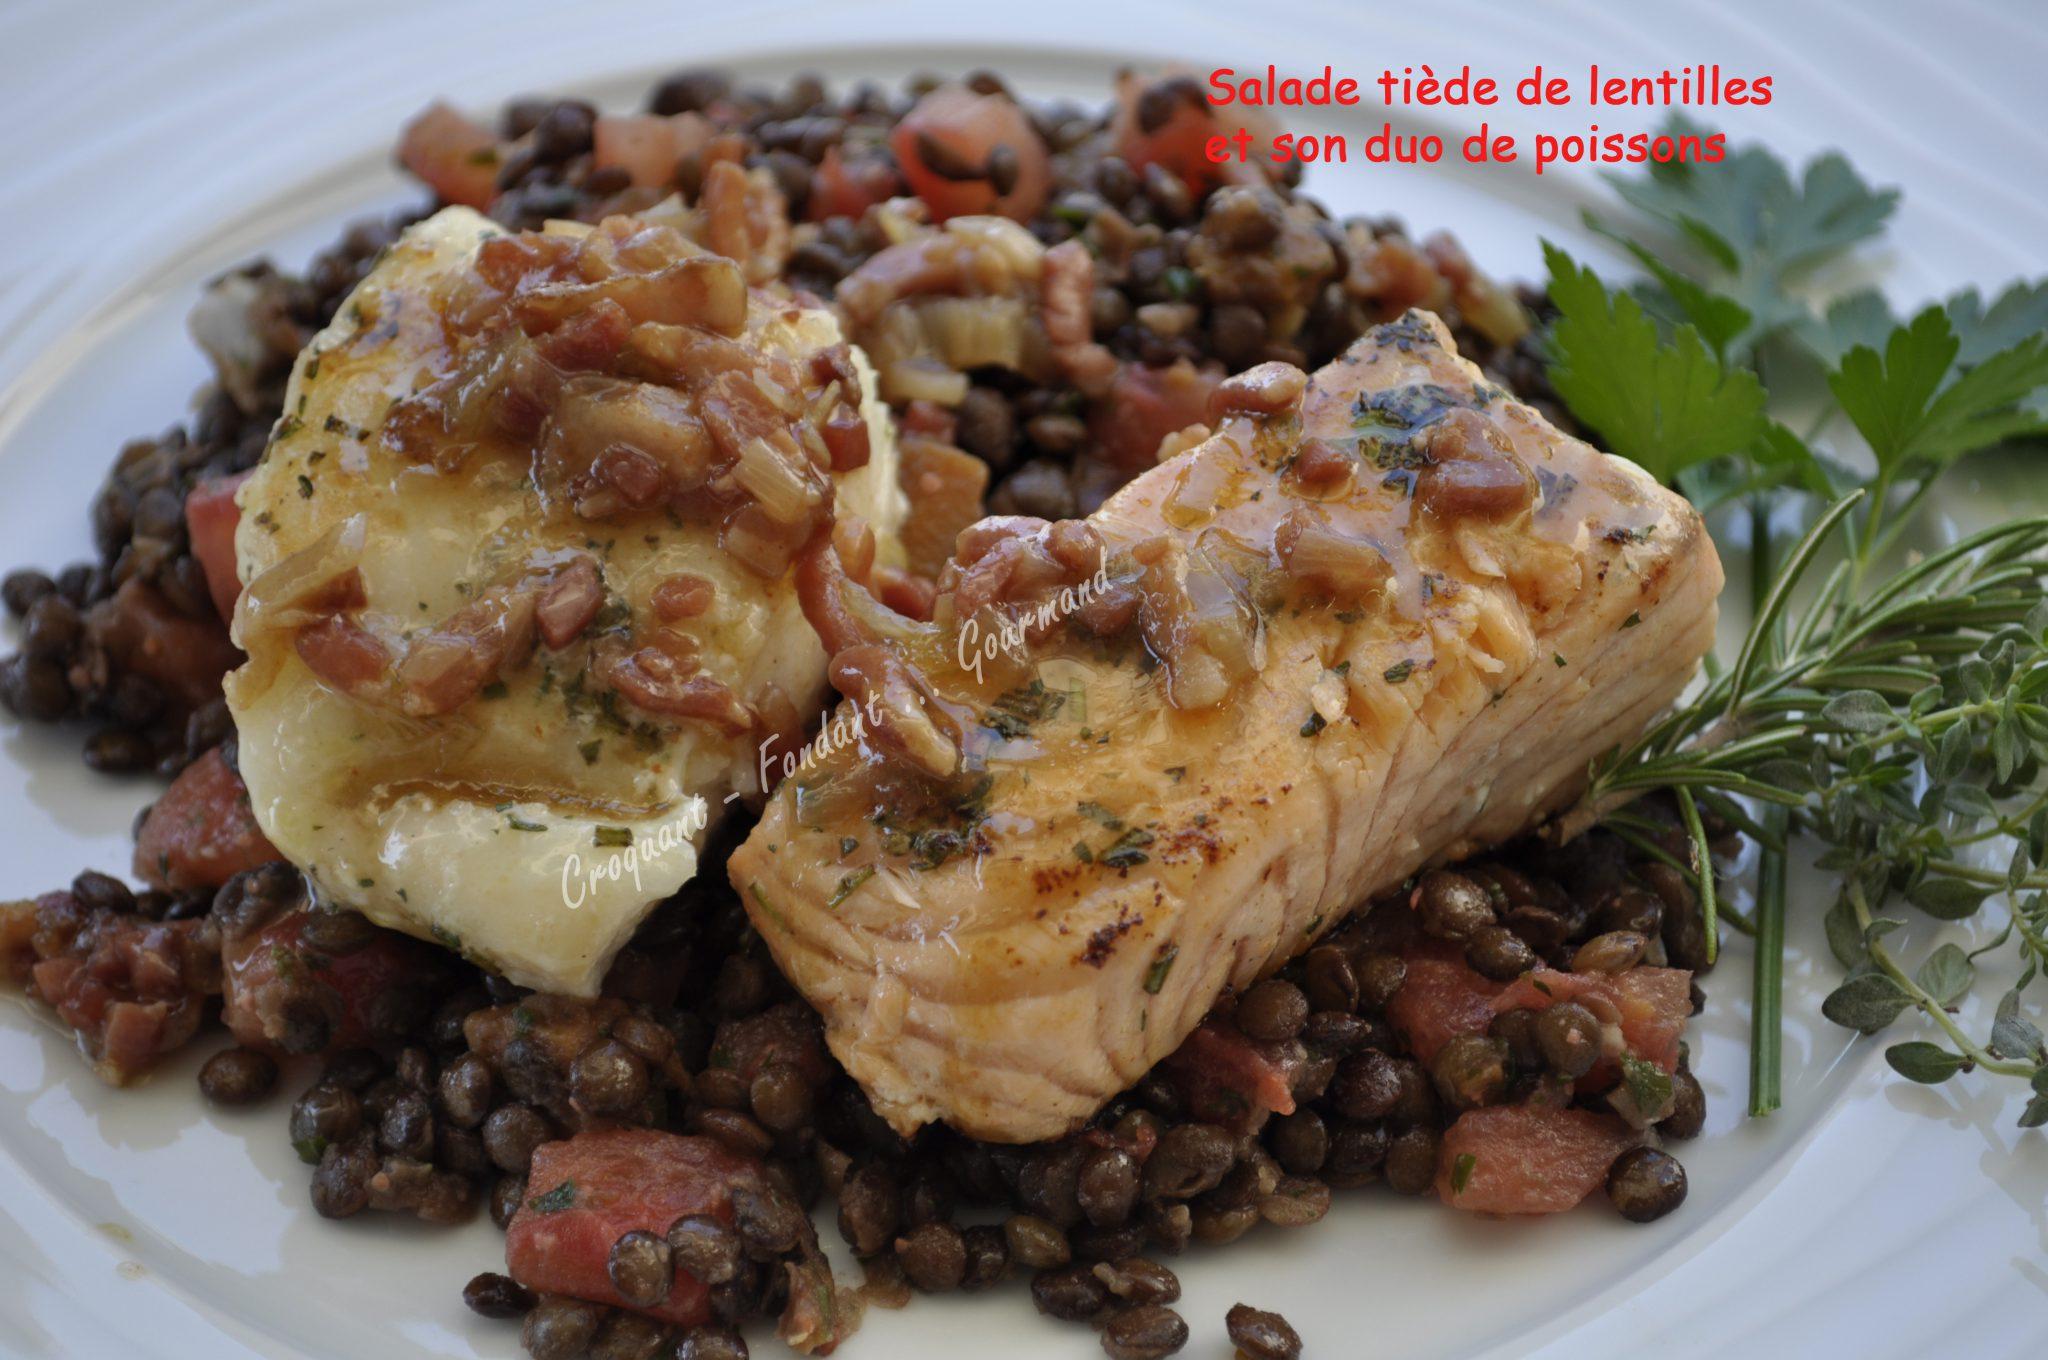 Salade de lentilles au duo de poissons croquant fondant for Salade poisson